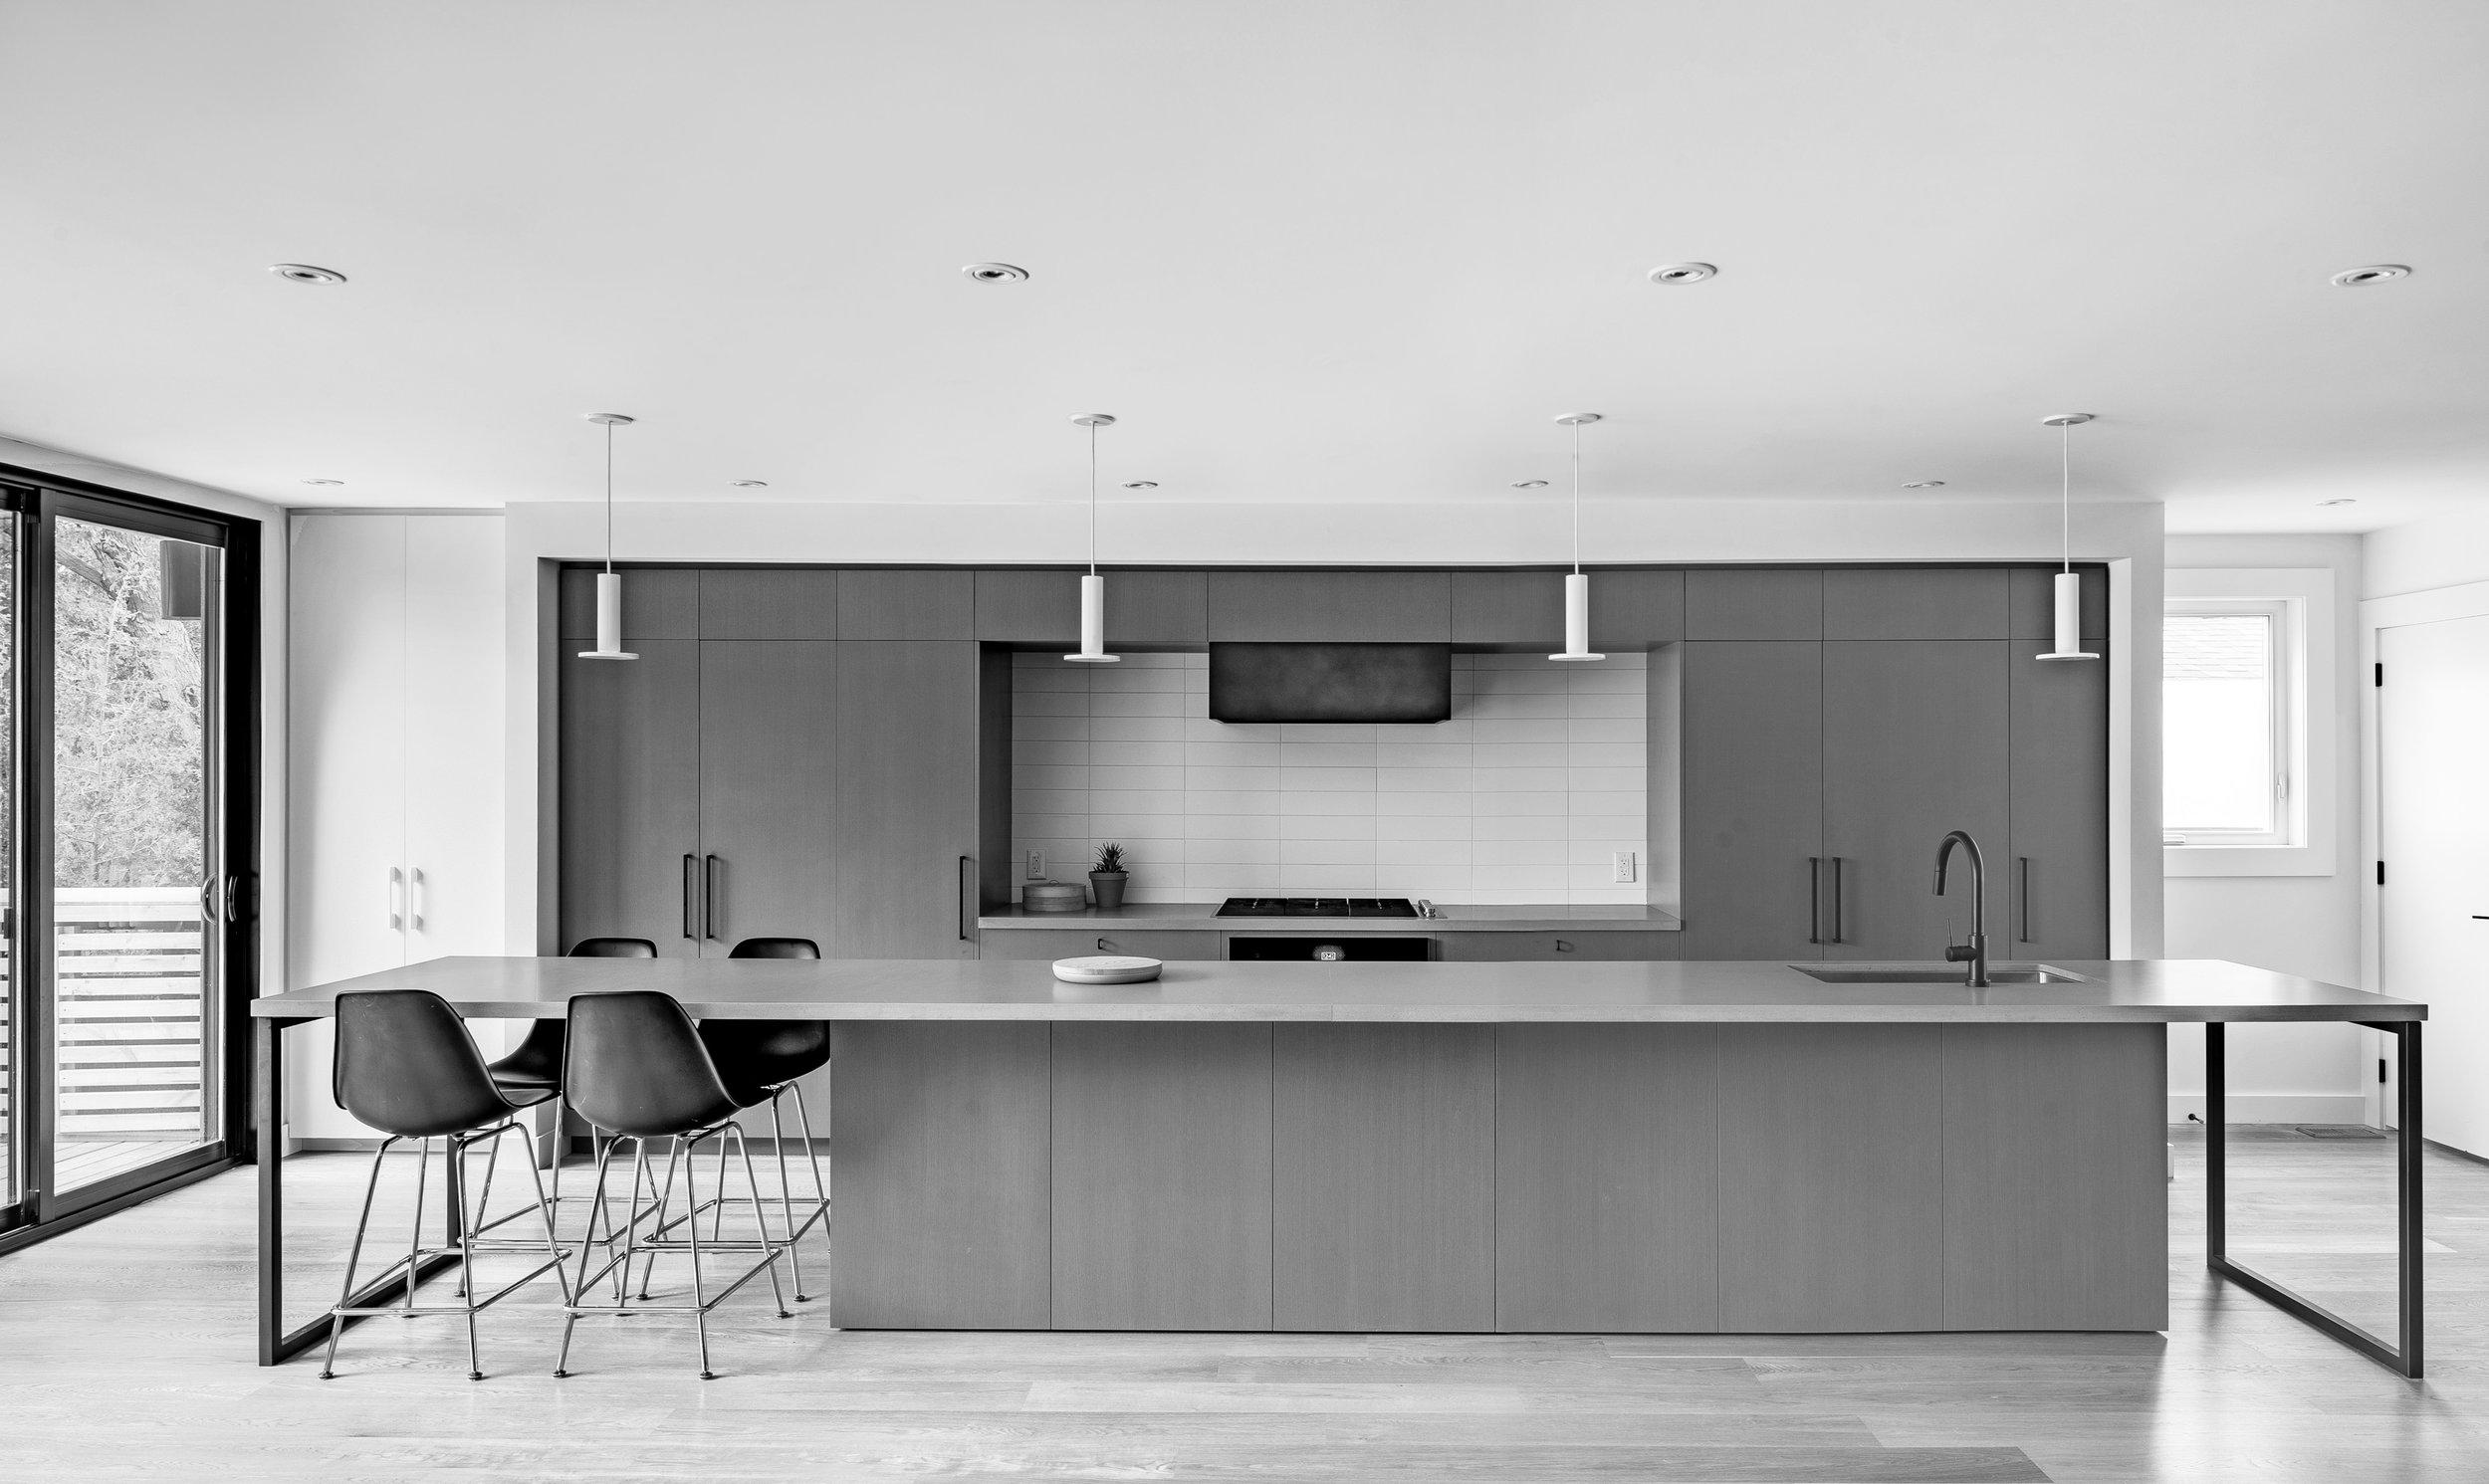 Studio AC - Southgate House-09.jpg